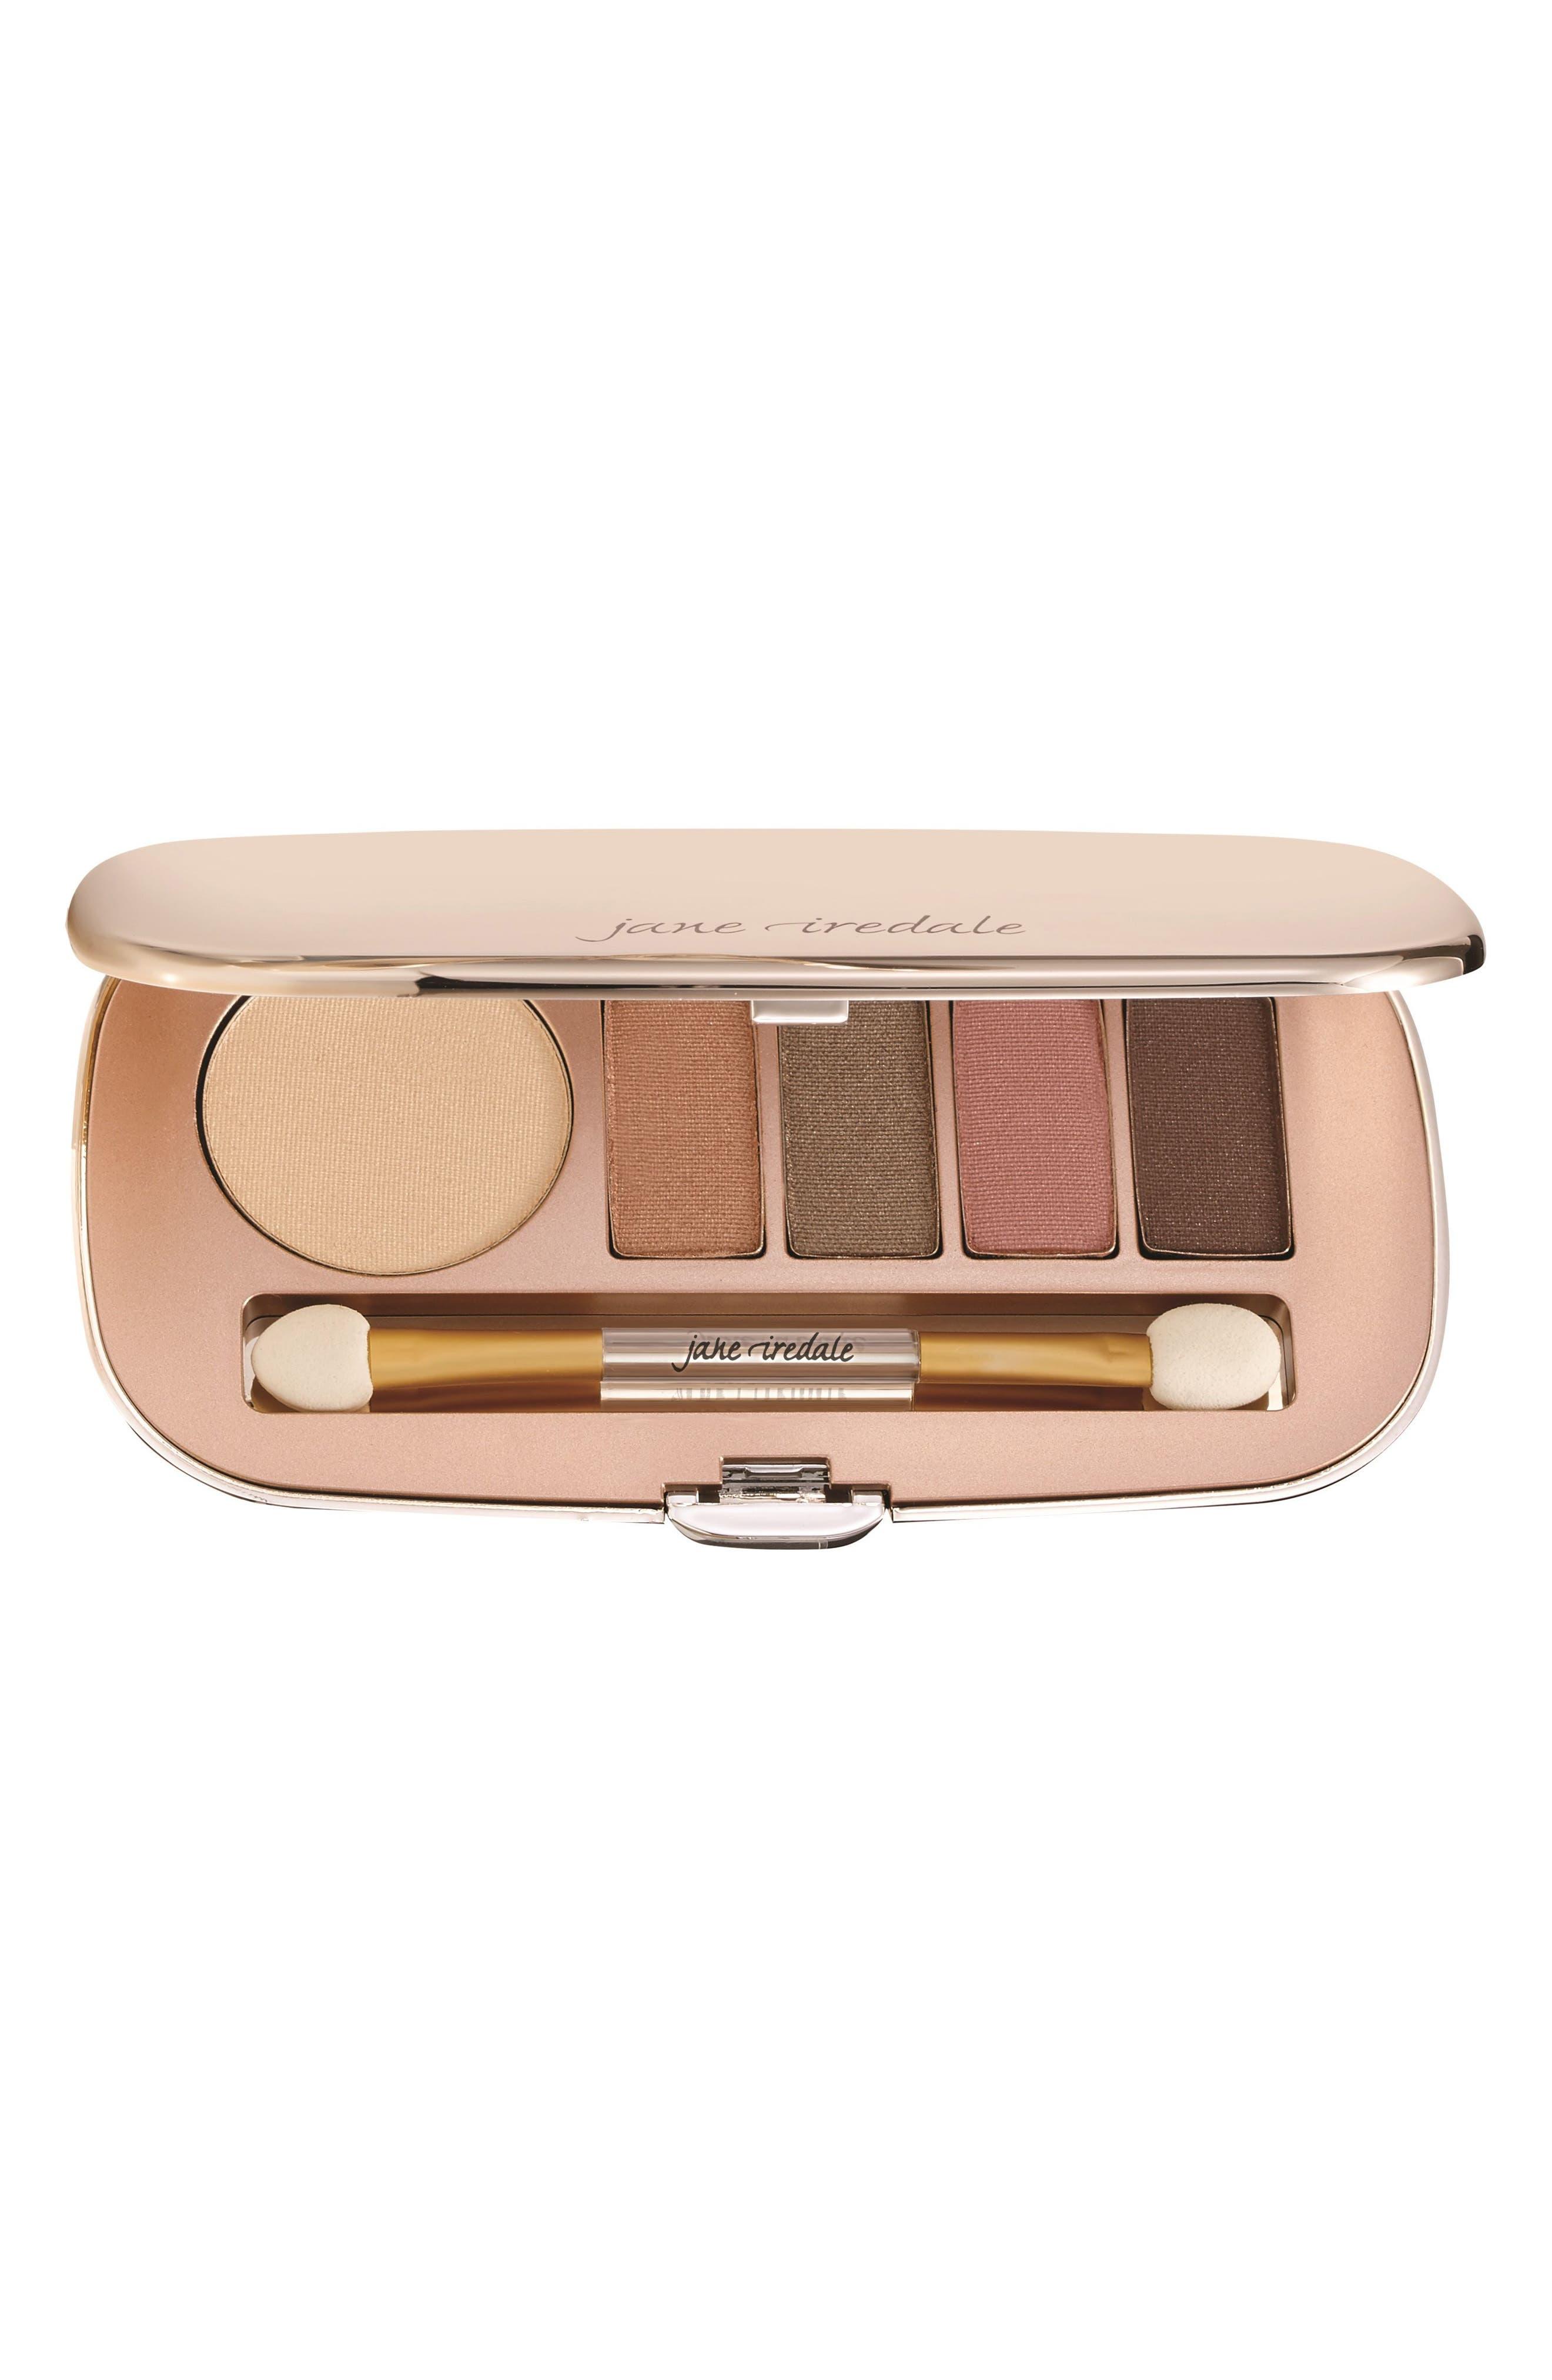 Naturally Glam Eyeshadow Kit